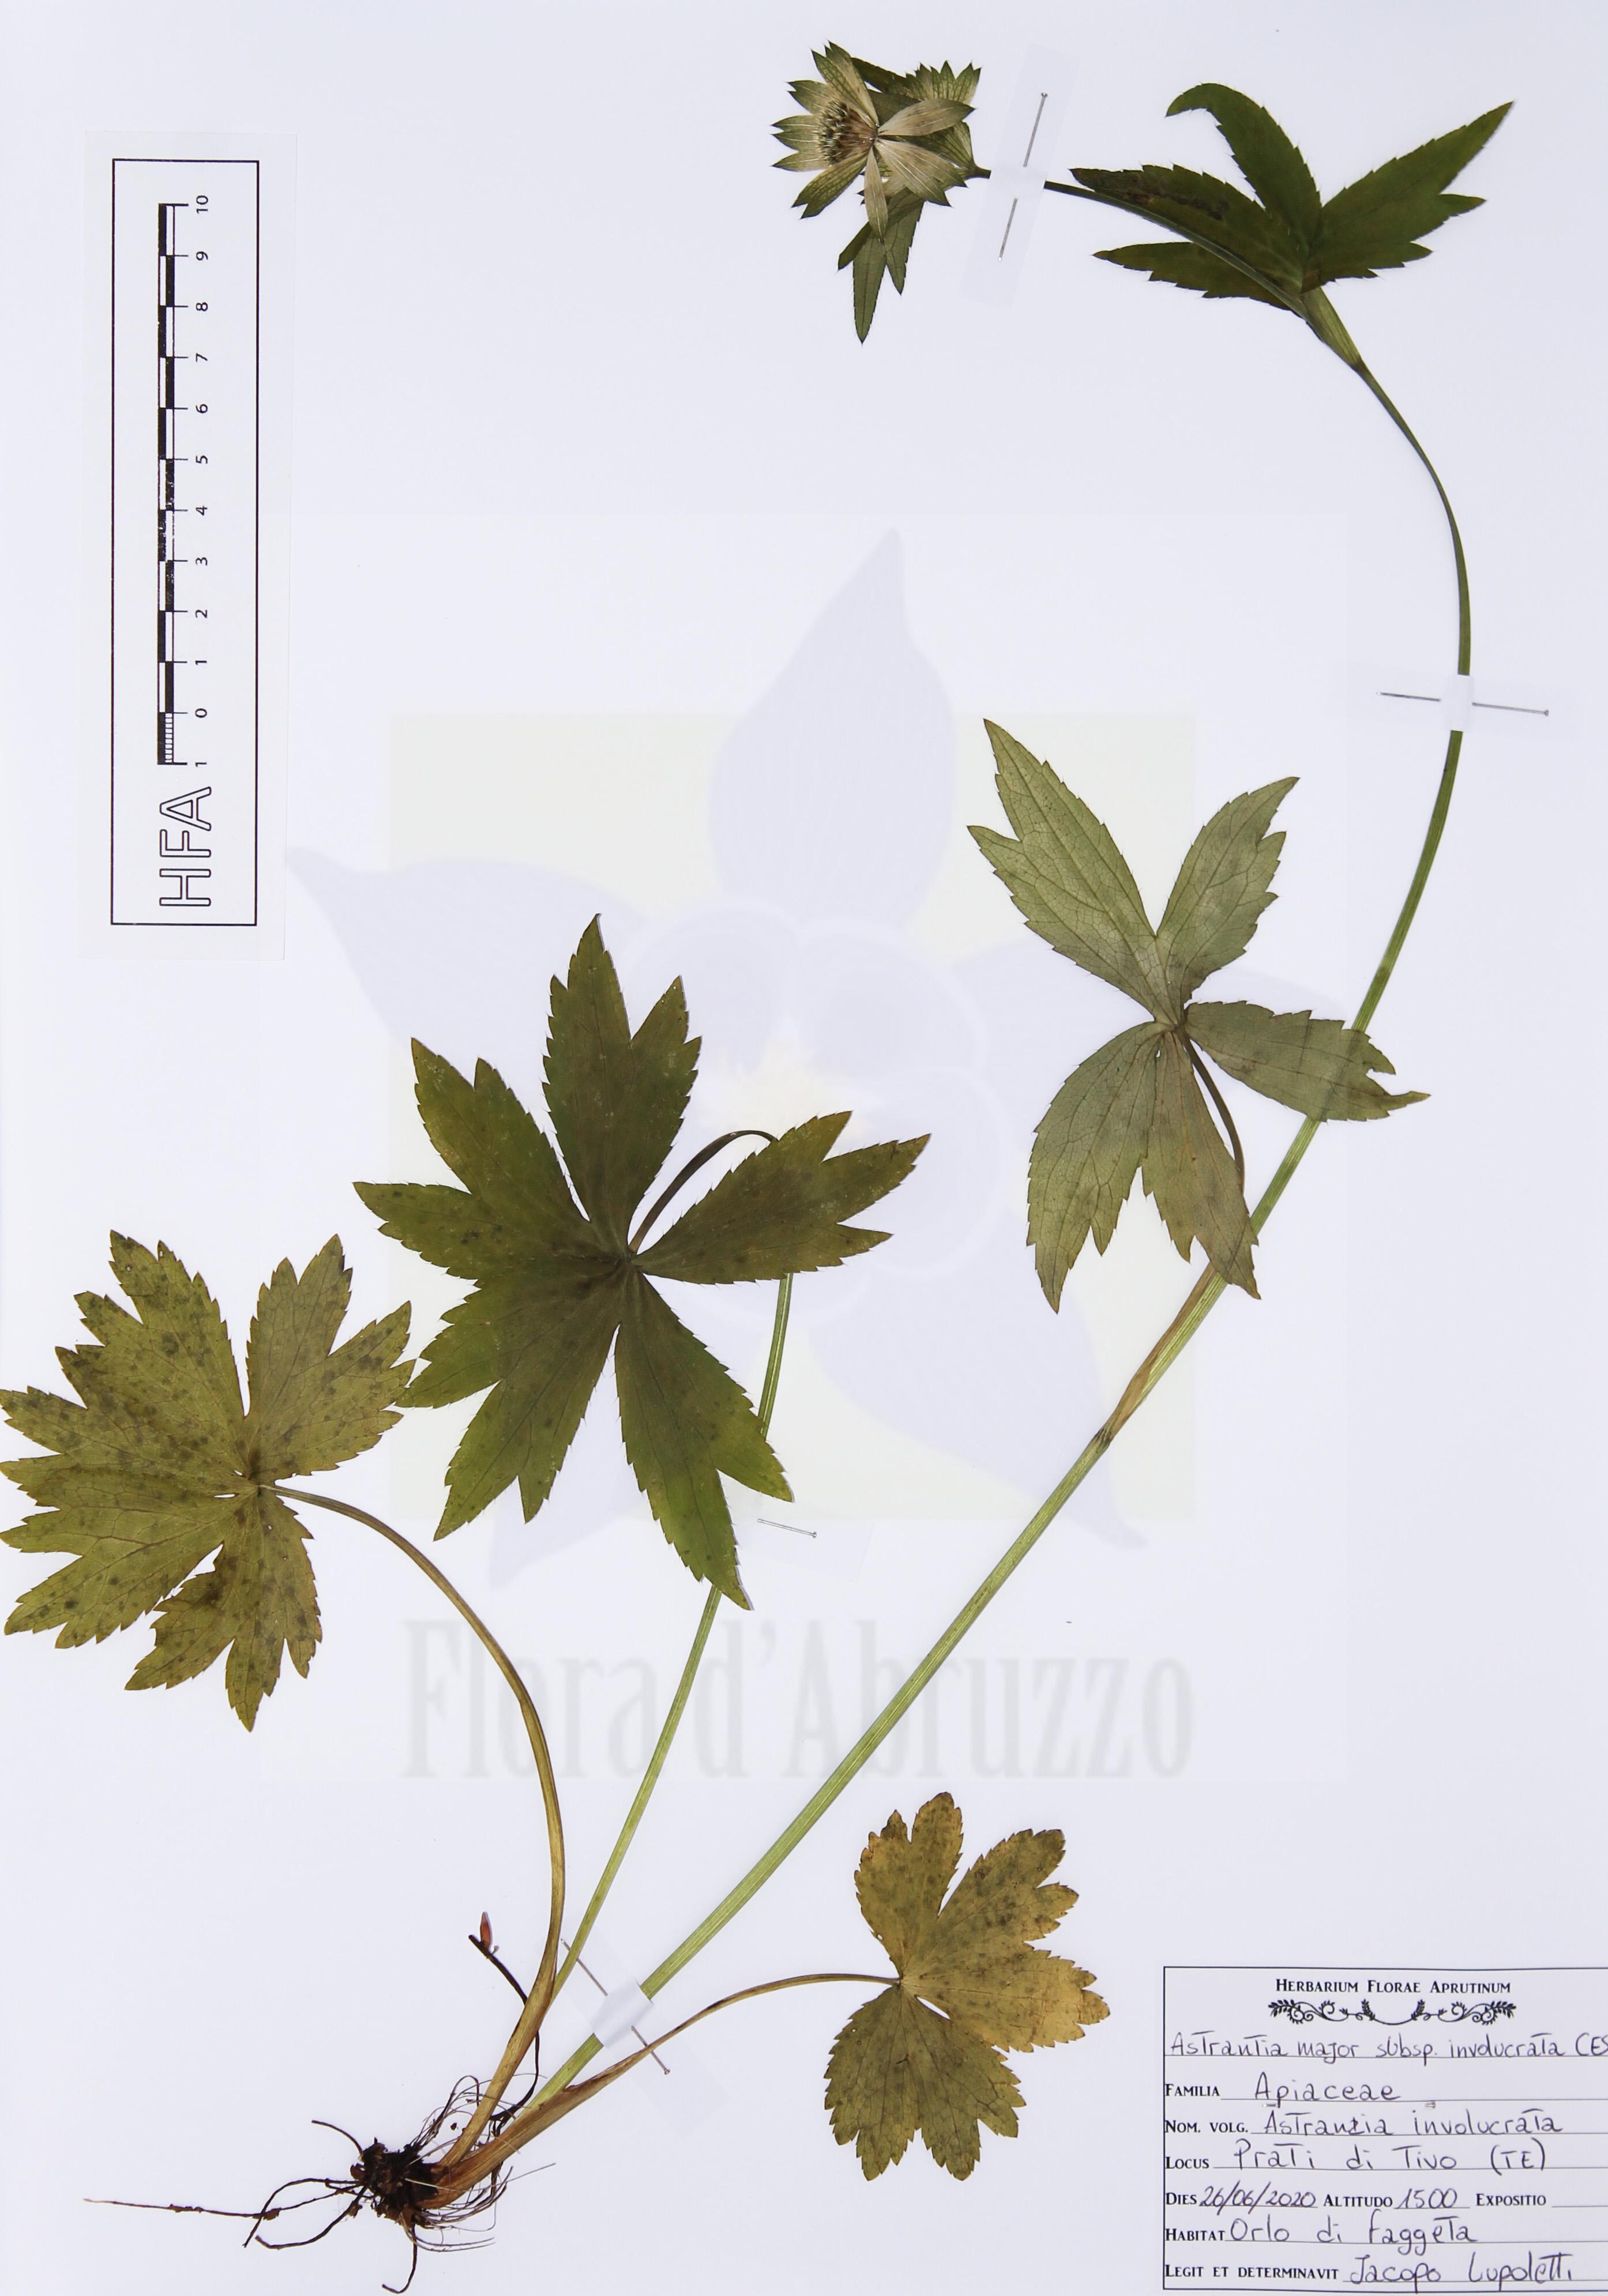 Astrantia major subsp. involucrata (W.D.J. Koch) Ces.